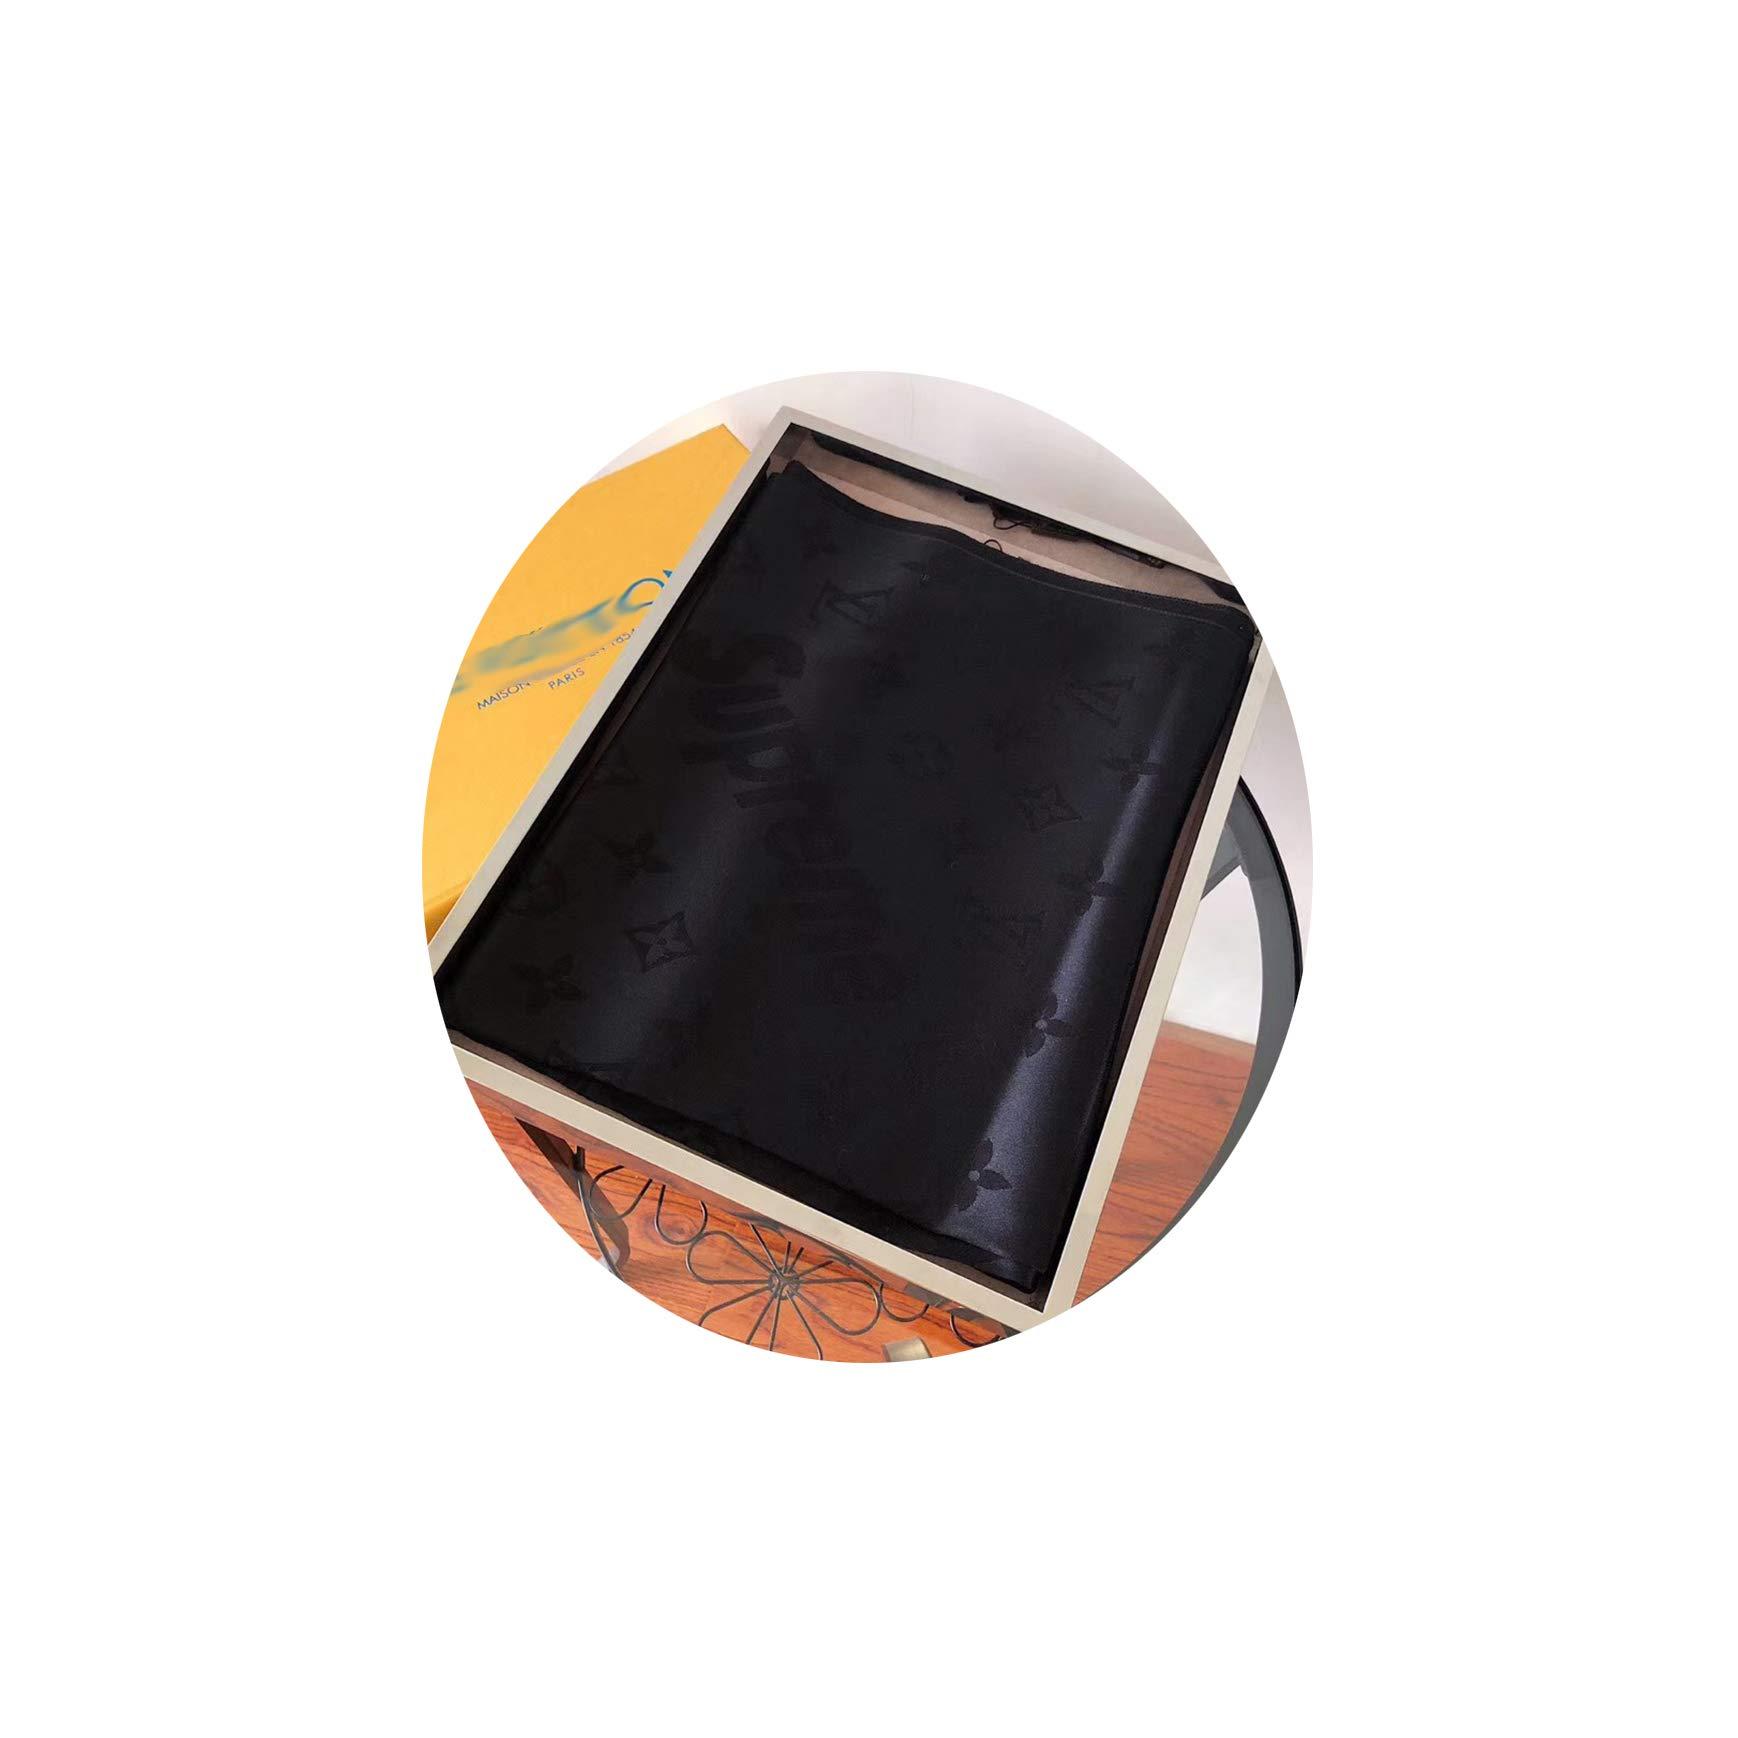 SCOOBEE Cashmere/Wool Scarf Black Warm Large Silk Scarves Fashion Luxury for Women Men(70.9''x27.6'') by SCOOBEE